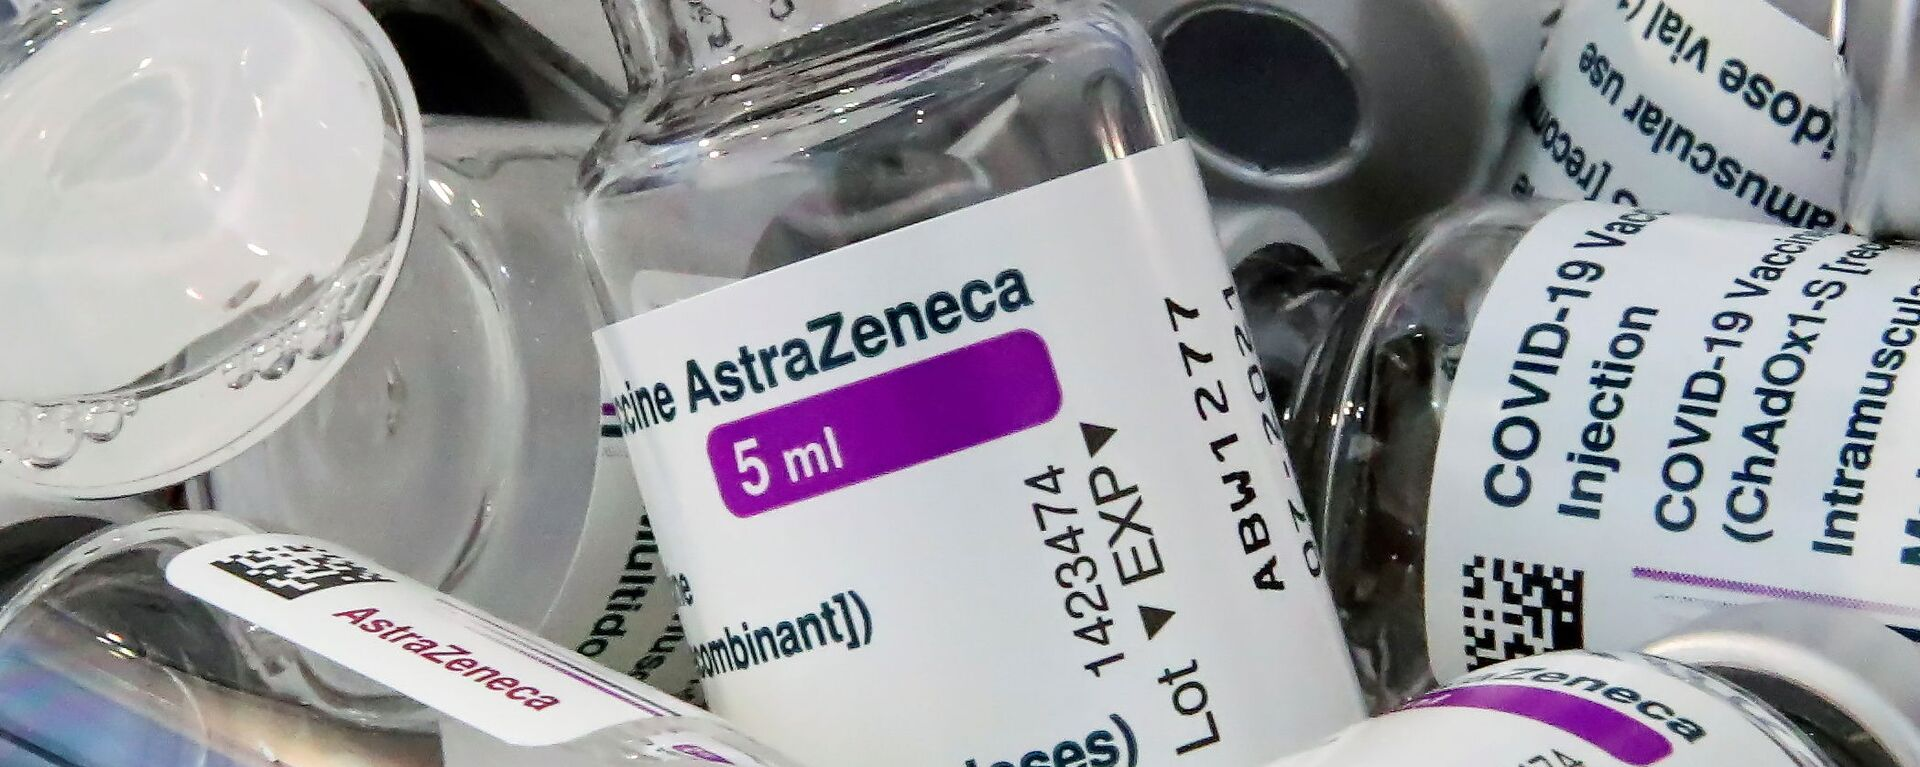 AstraZeneca's COVID-19 vaccine are pictured amid a vaccination campaign in Bierset, Belgium March 17, 2021 - Sputnik Ελλάδα, 1920, 14.06.2021